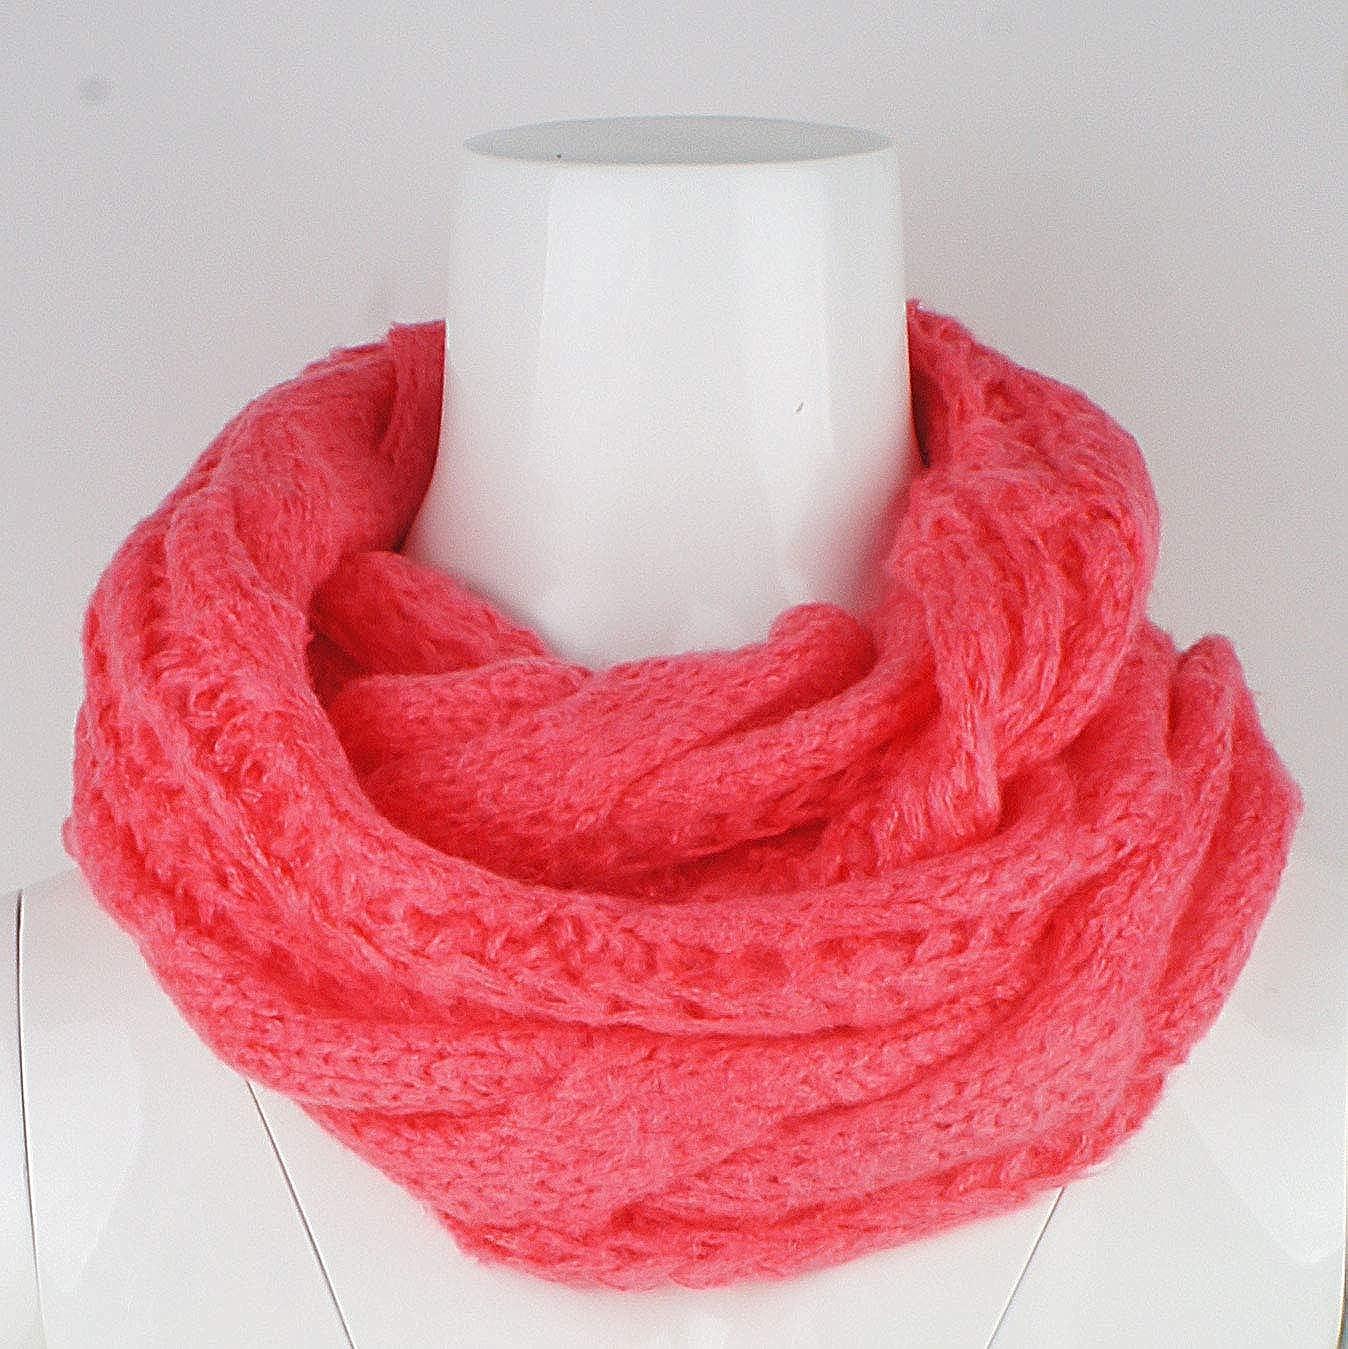 VIVIAN /& VINCENT Womens Thick Ribbed Knit Winter Infinity Circle Loop Scarf